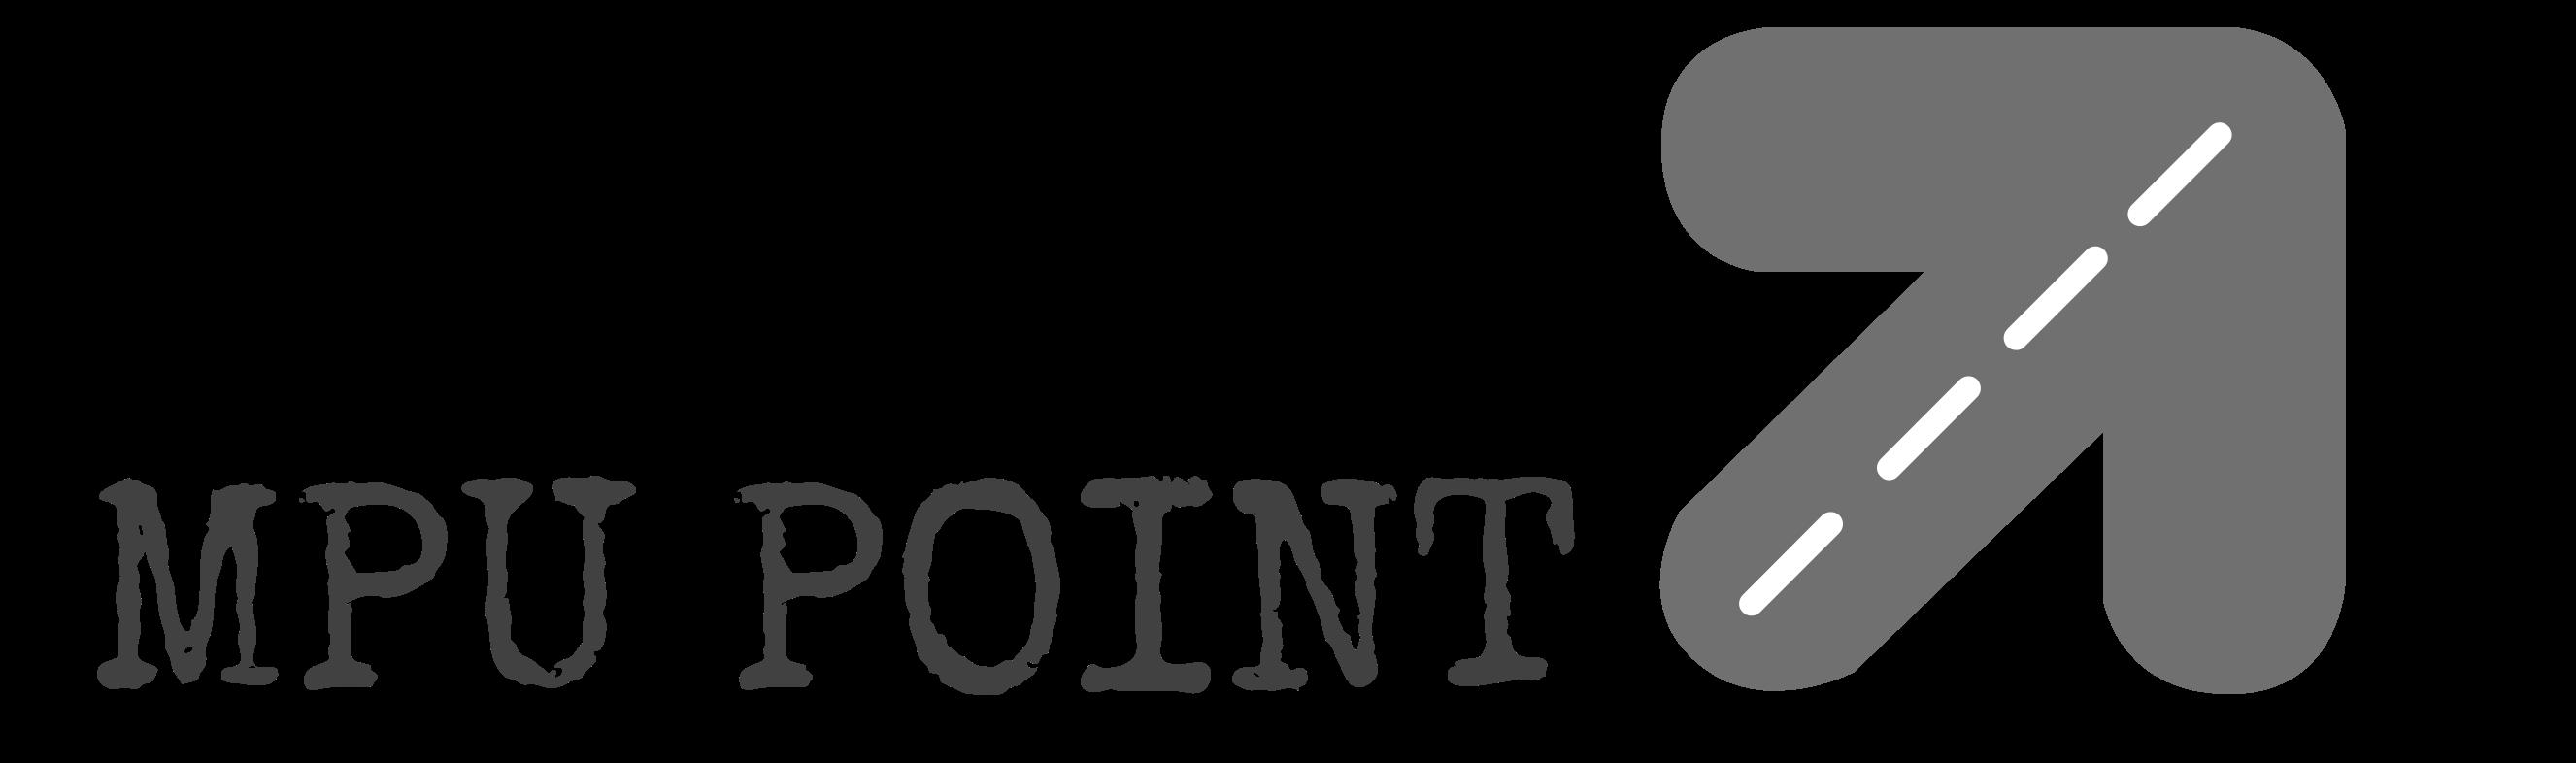 MPU Point Logo